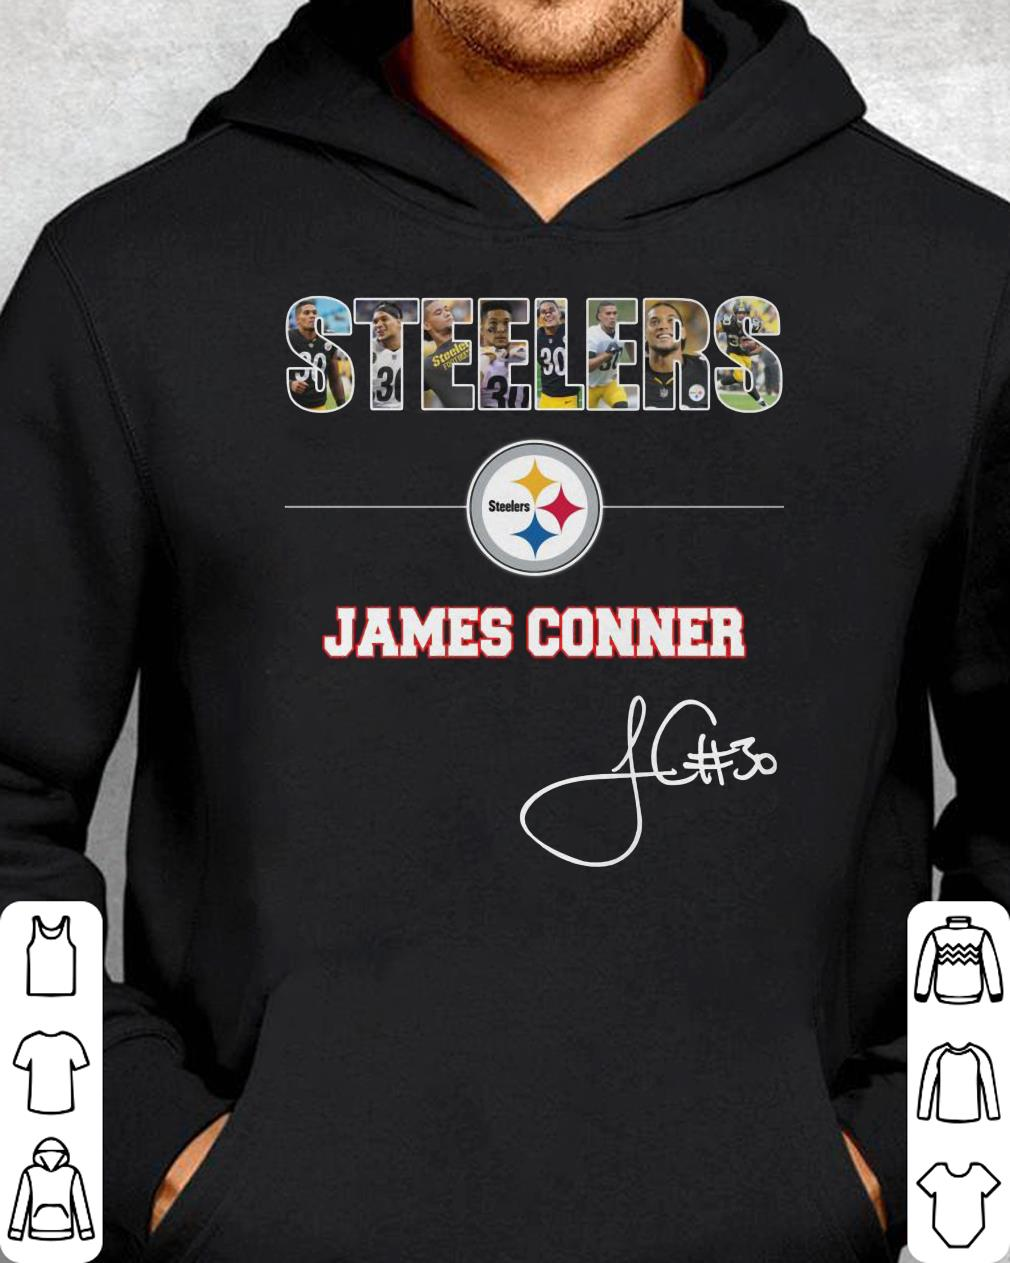 b1abbedc5c2 Premium Trending Christmas Presents Who Love: Steelers, James Conner,  Signature